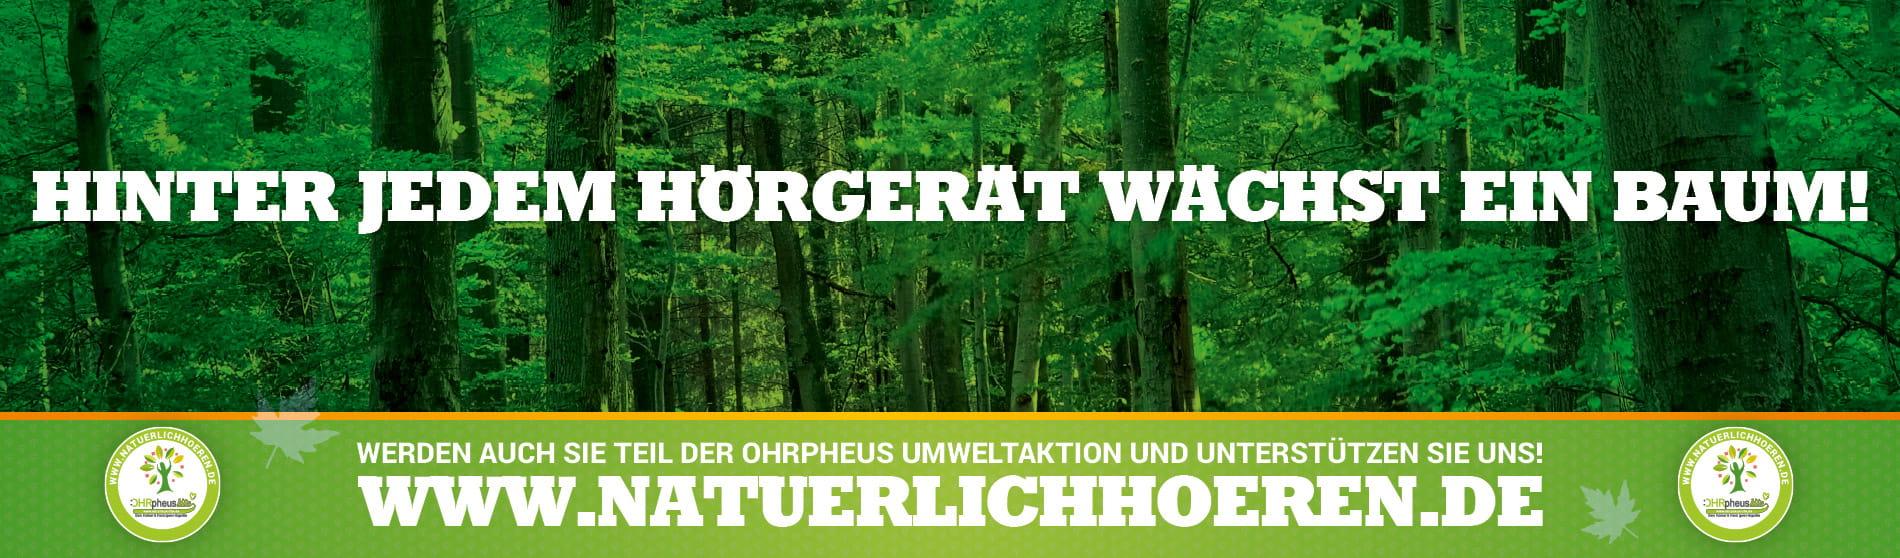 OHRpheus lite Umweltaktion Wald dunkelgrün